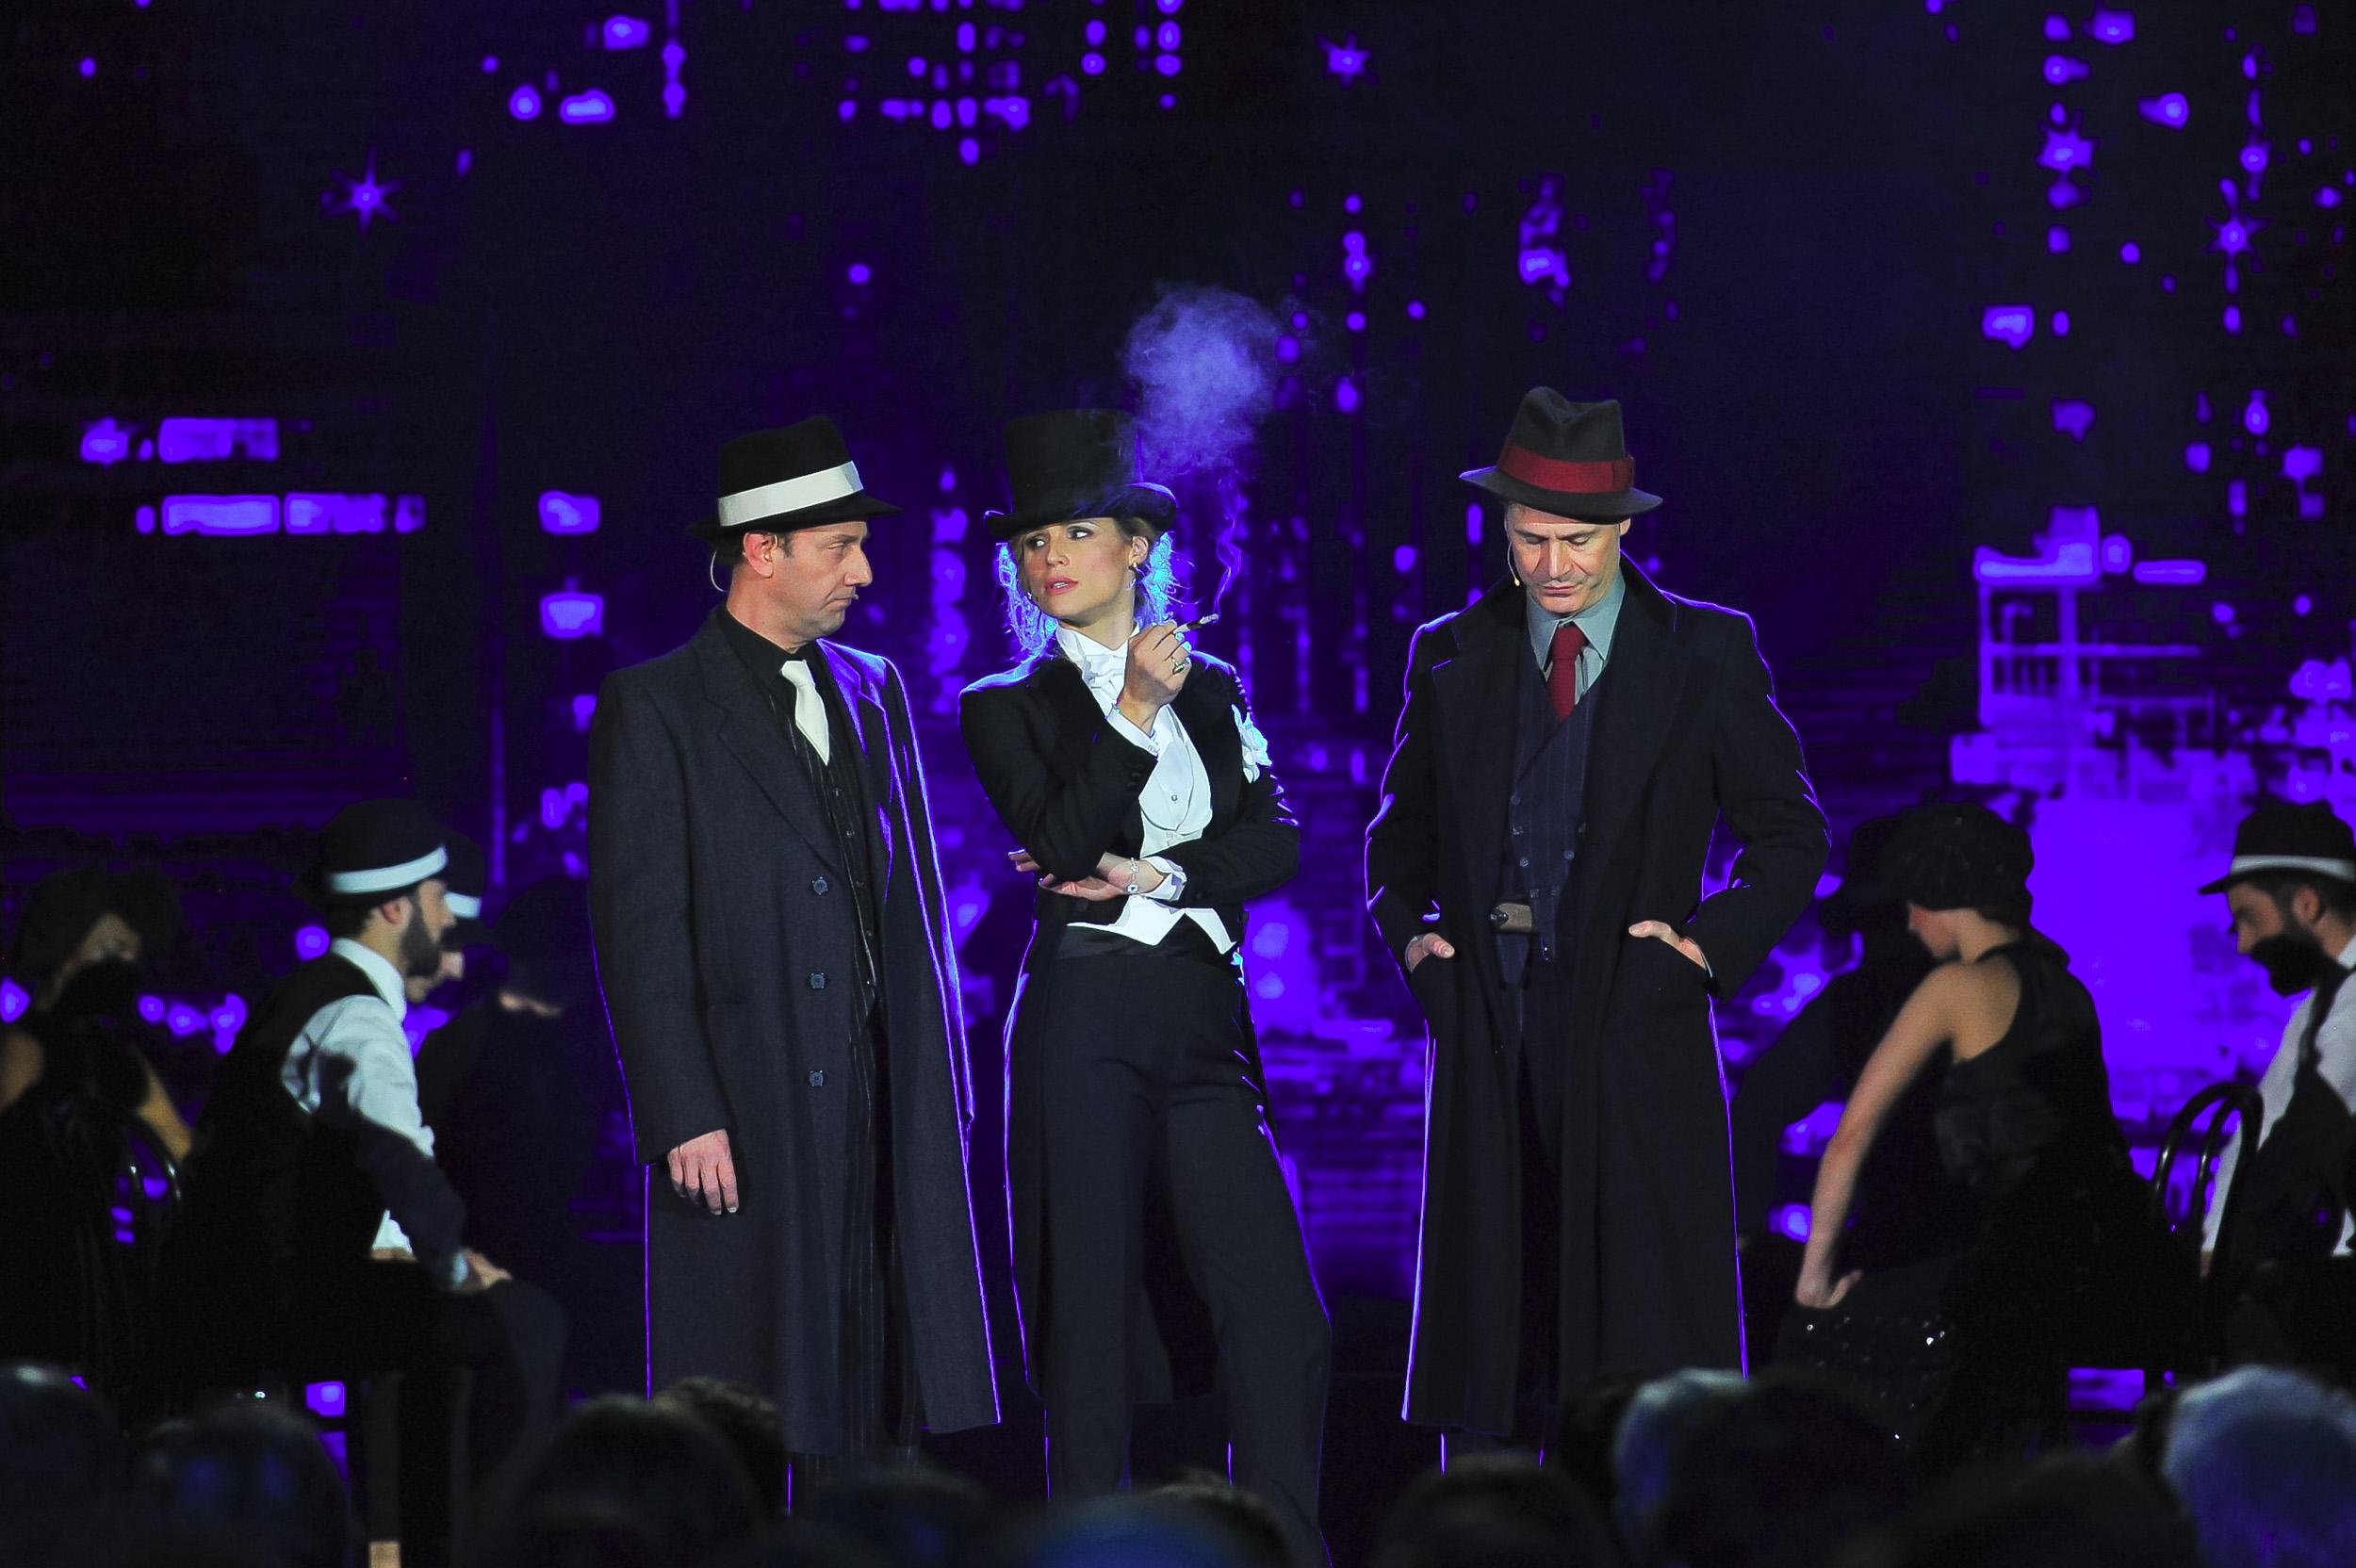 Alessandro Besentini;Michelle Hunziker;Francesco Villa